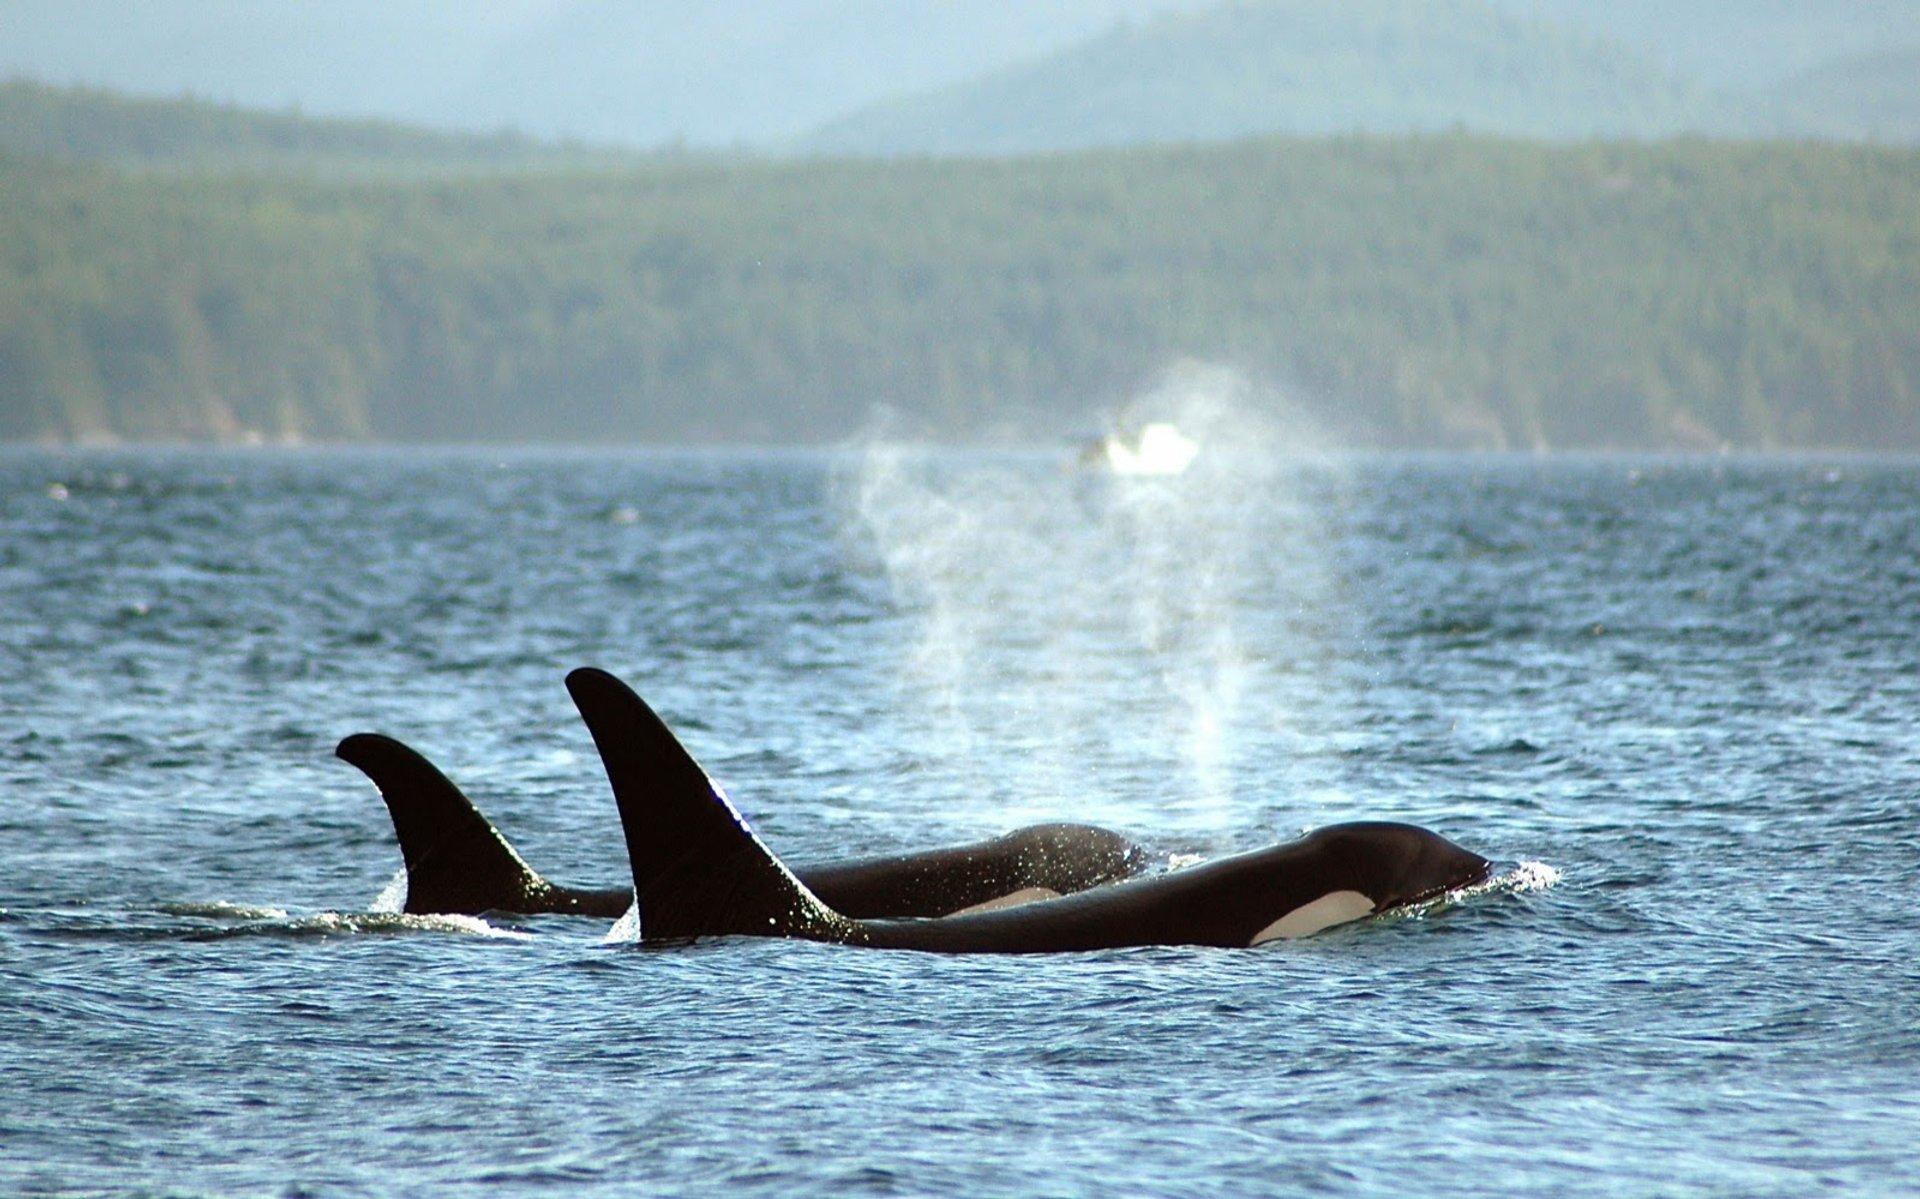 Whale Watching in British Columbia - Best Season 2020